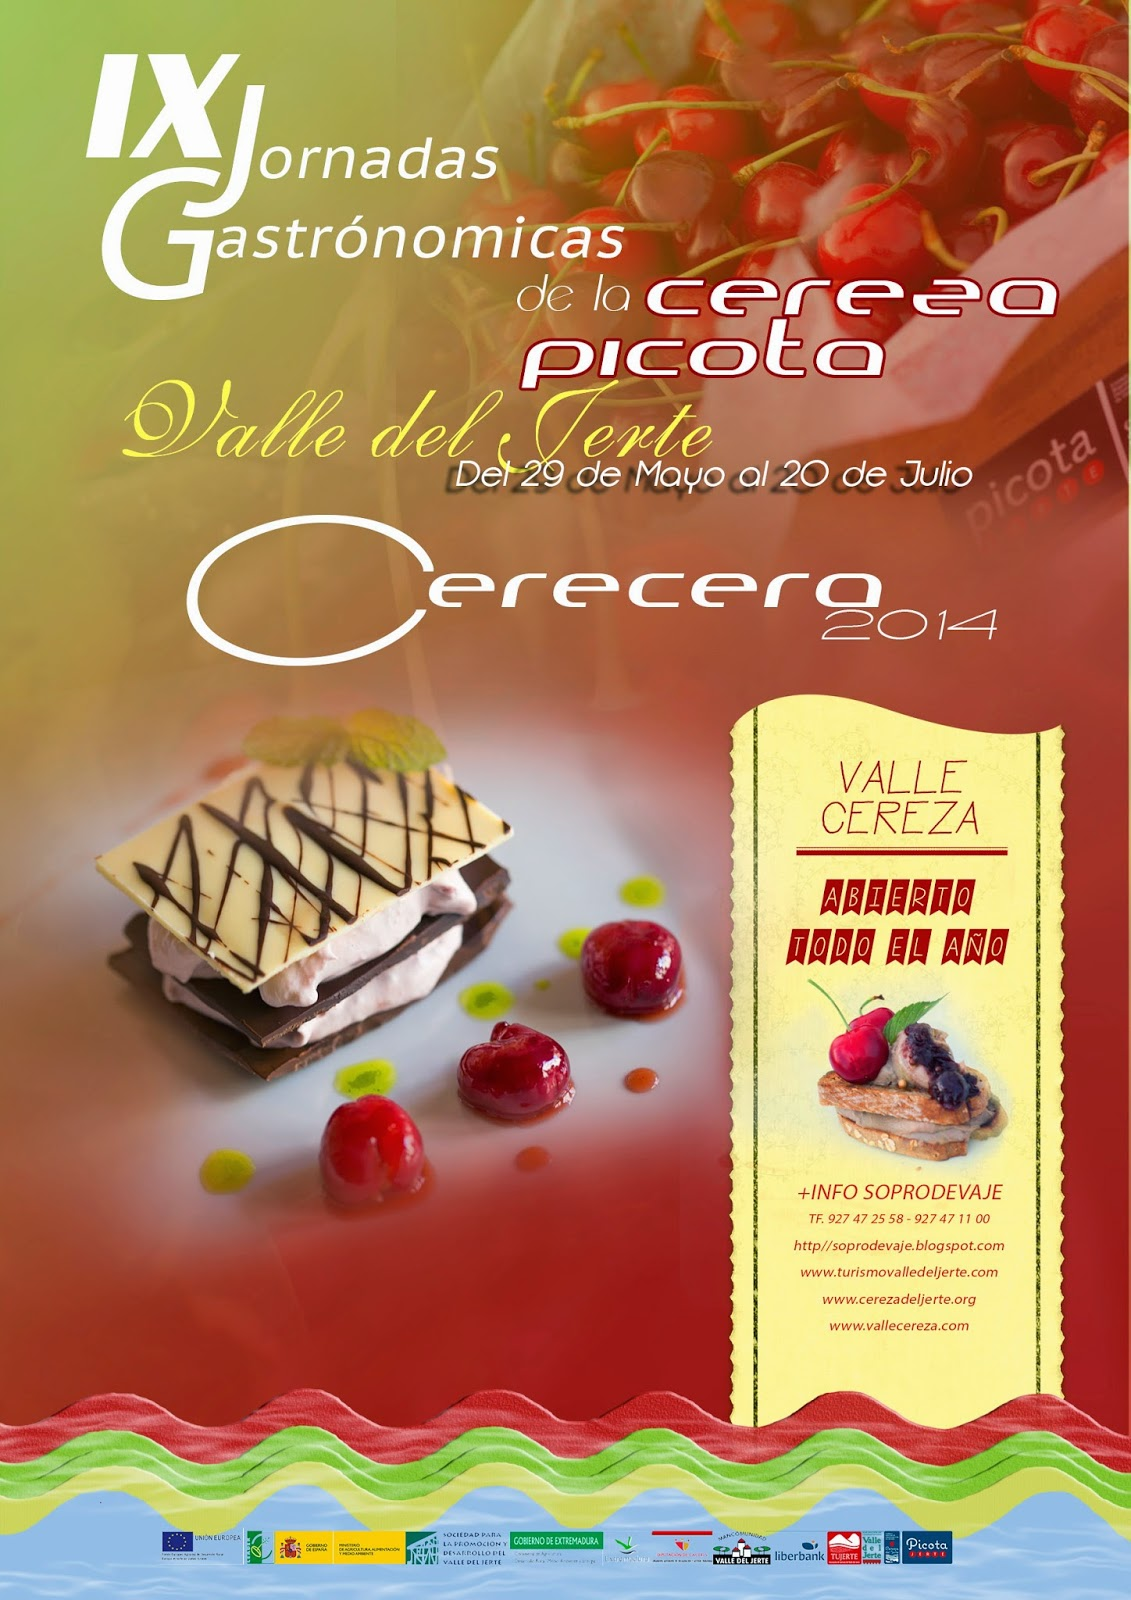 IX Jornadas Gastronómicas de la Cereza Picota